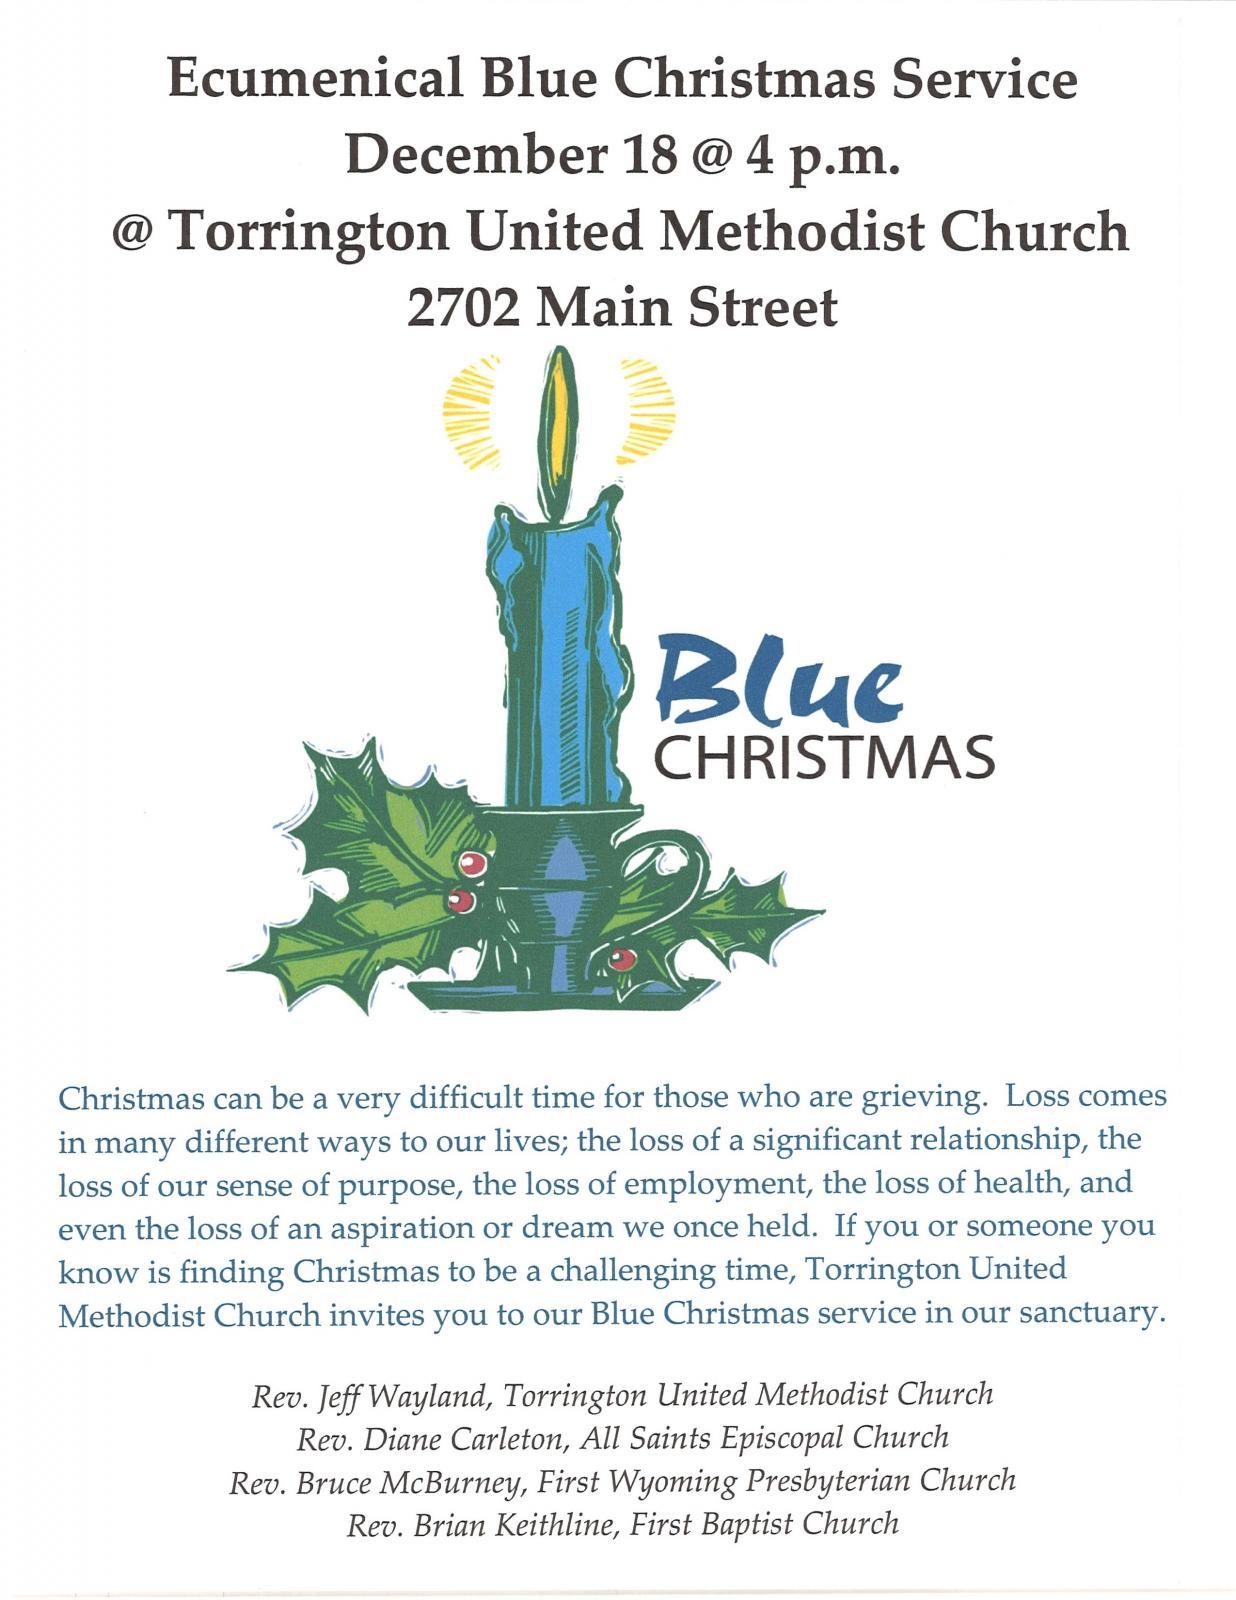 Ecumenical Blue Christmas Service Photo